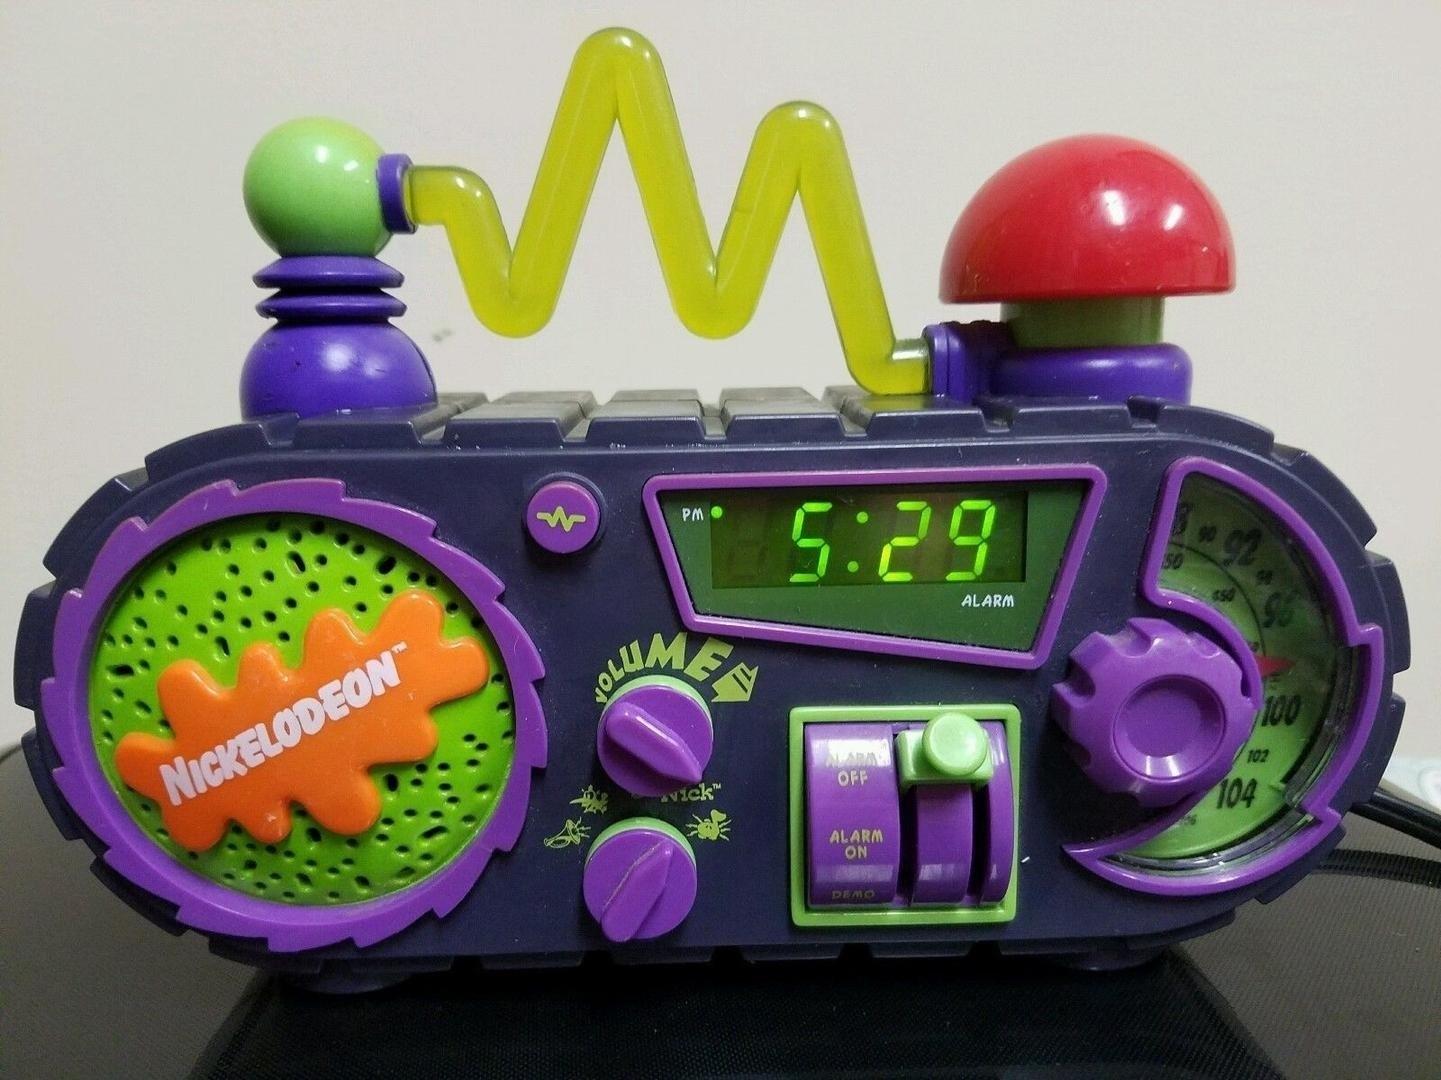 A purple and black mad scientist looking alarm clock